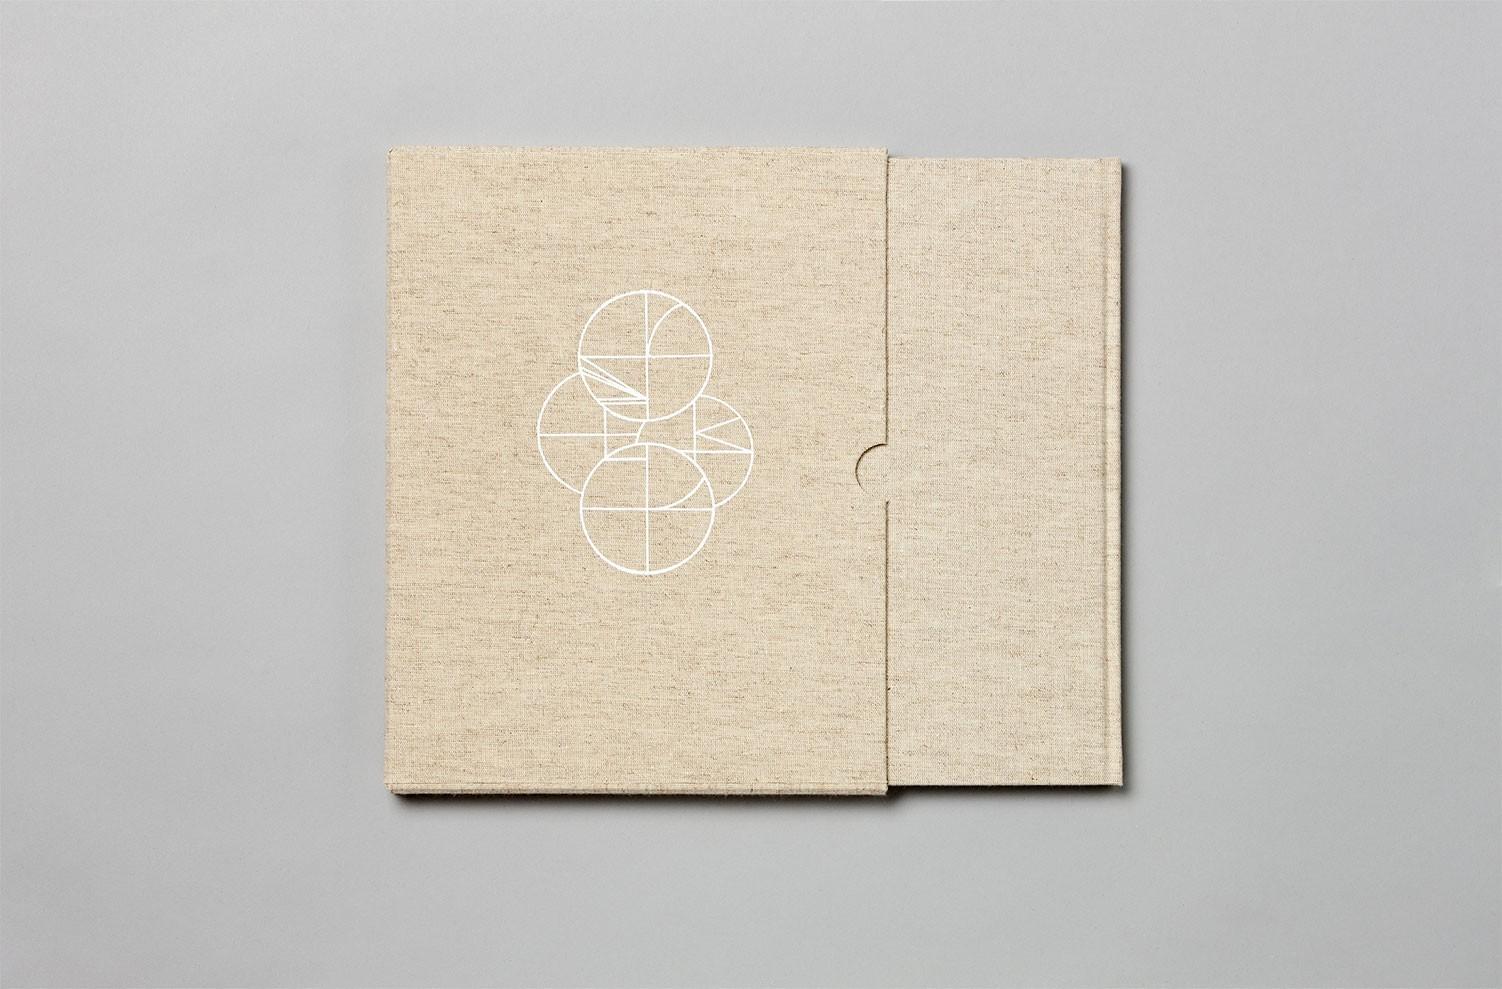 ritator_hans_andersson_artist_book_3